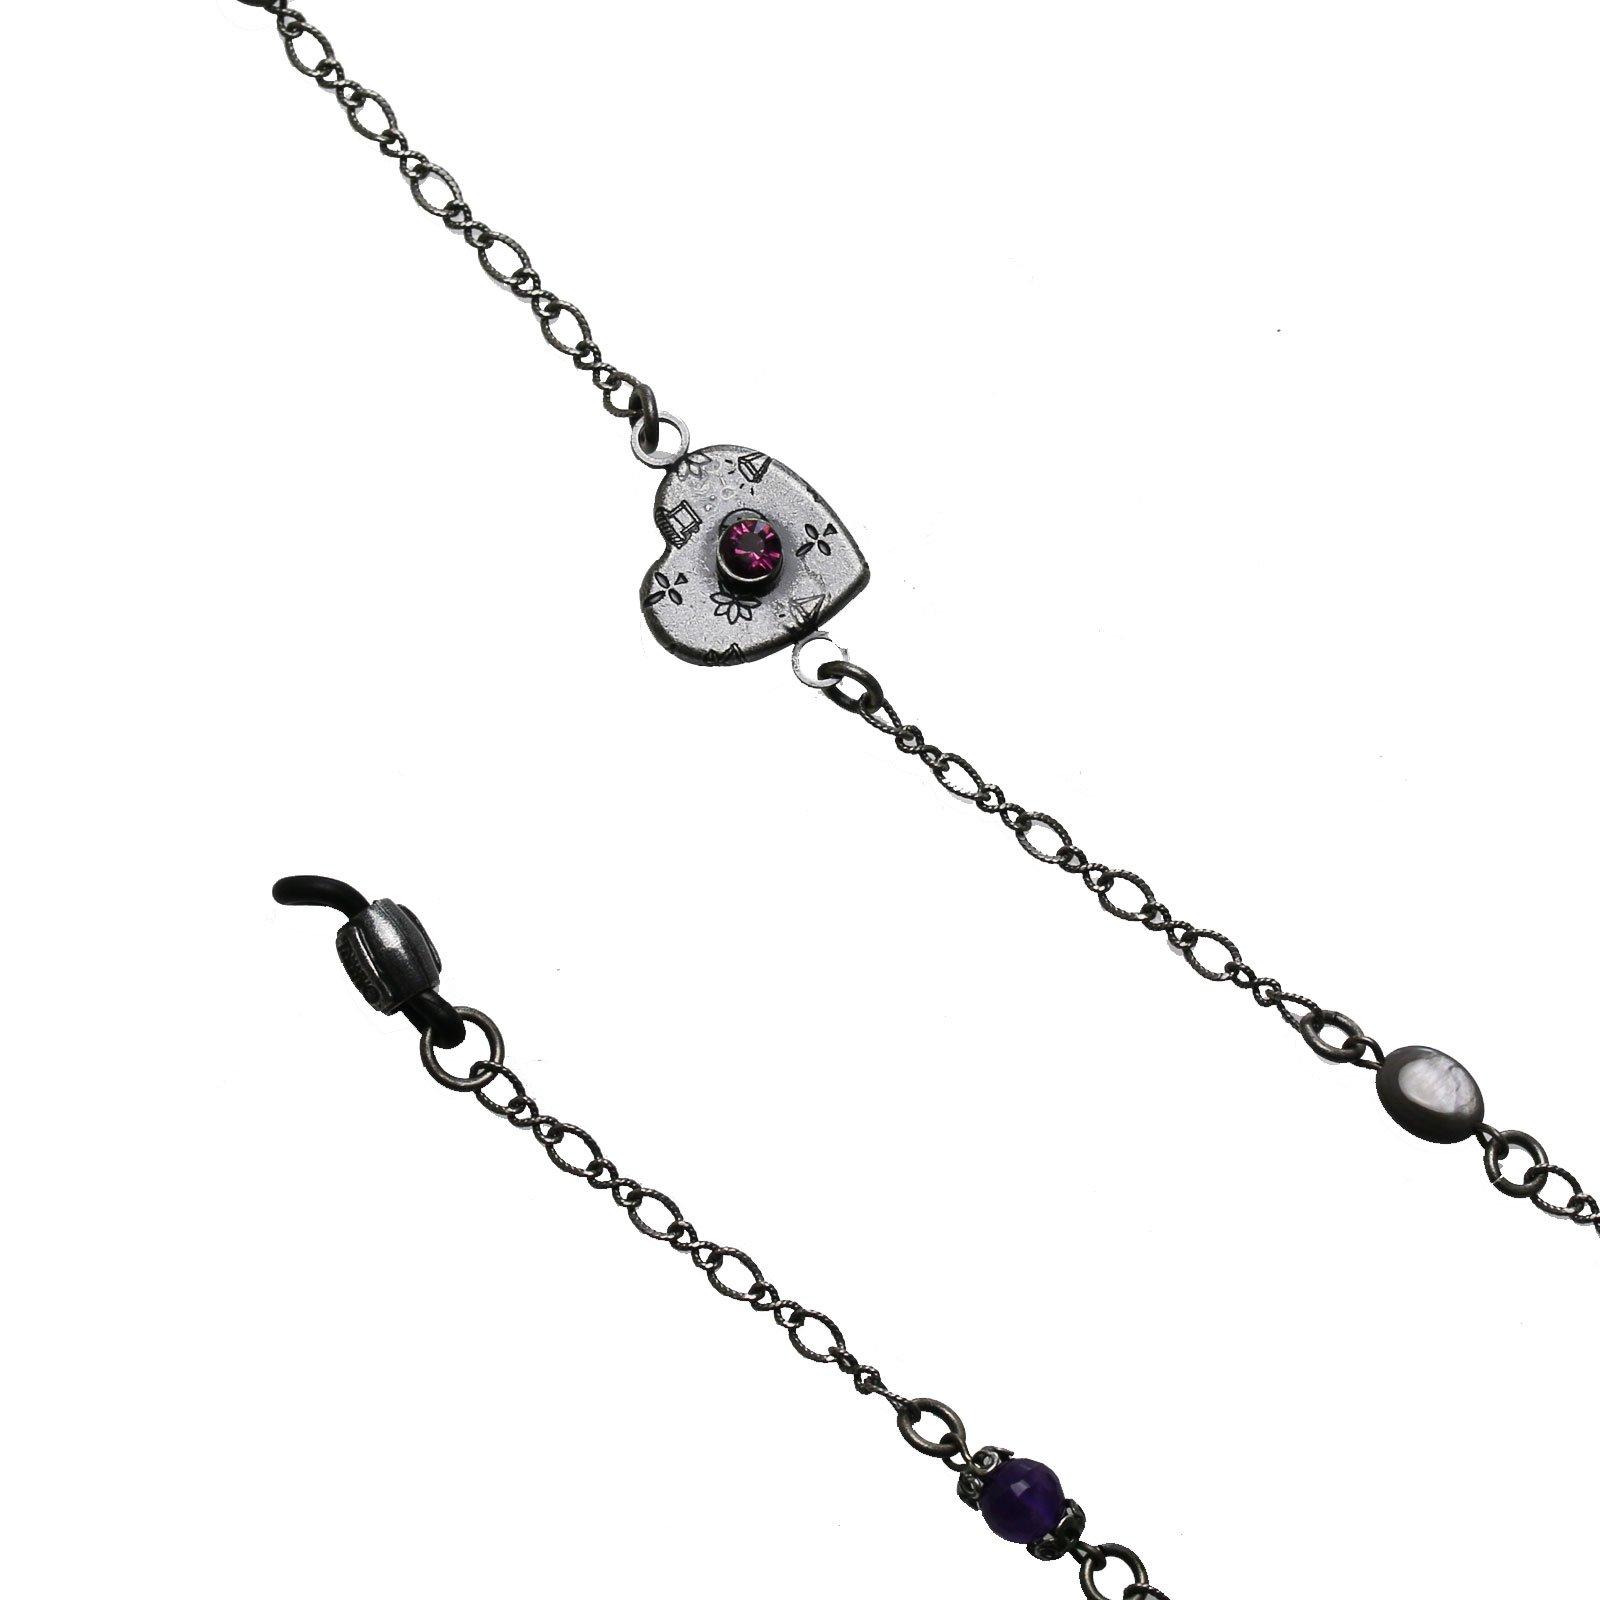 Tamarusan Eyewear Chain Heart Gray Shell Amethyst Unisex Eyeglasses Code by TAMARUSAN (Image #3)